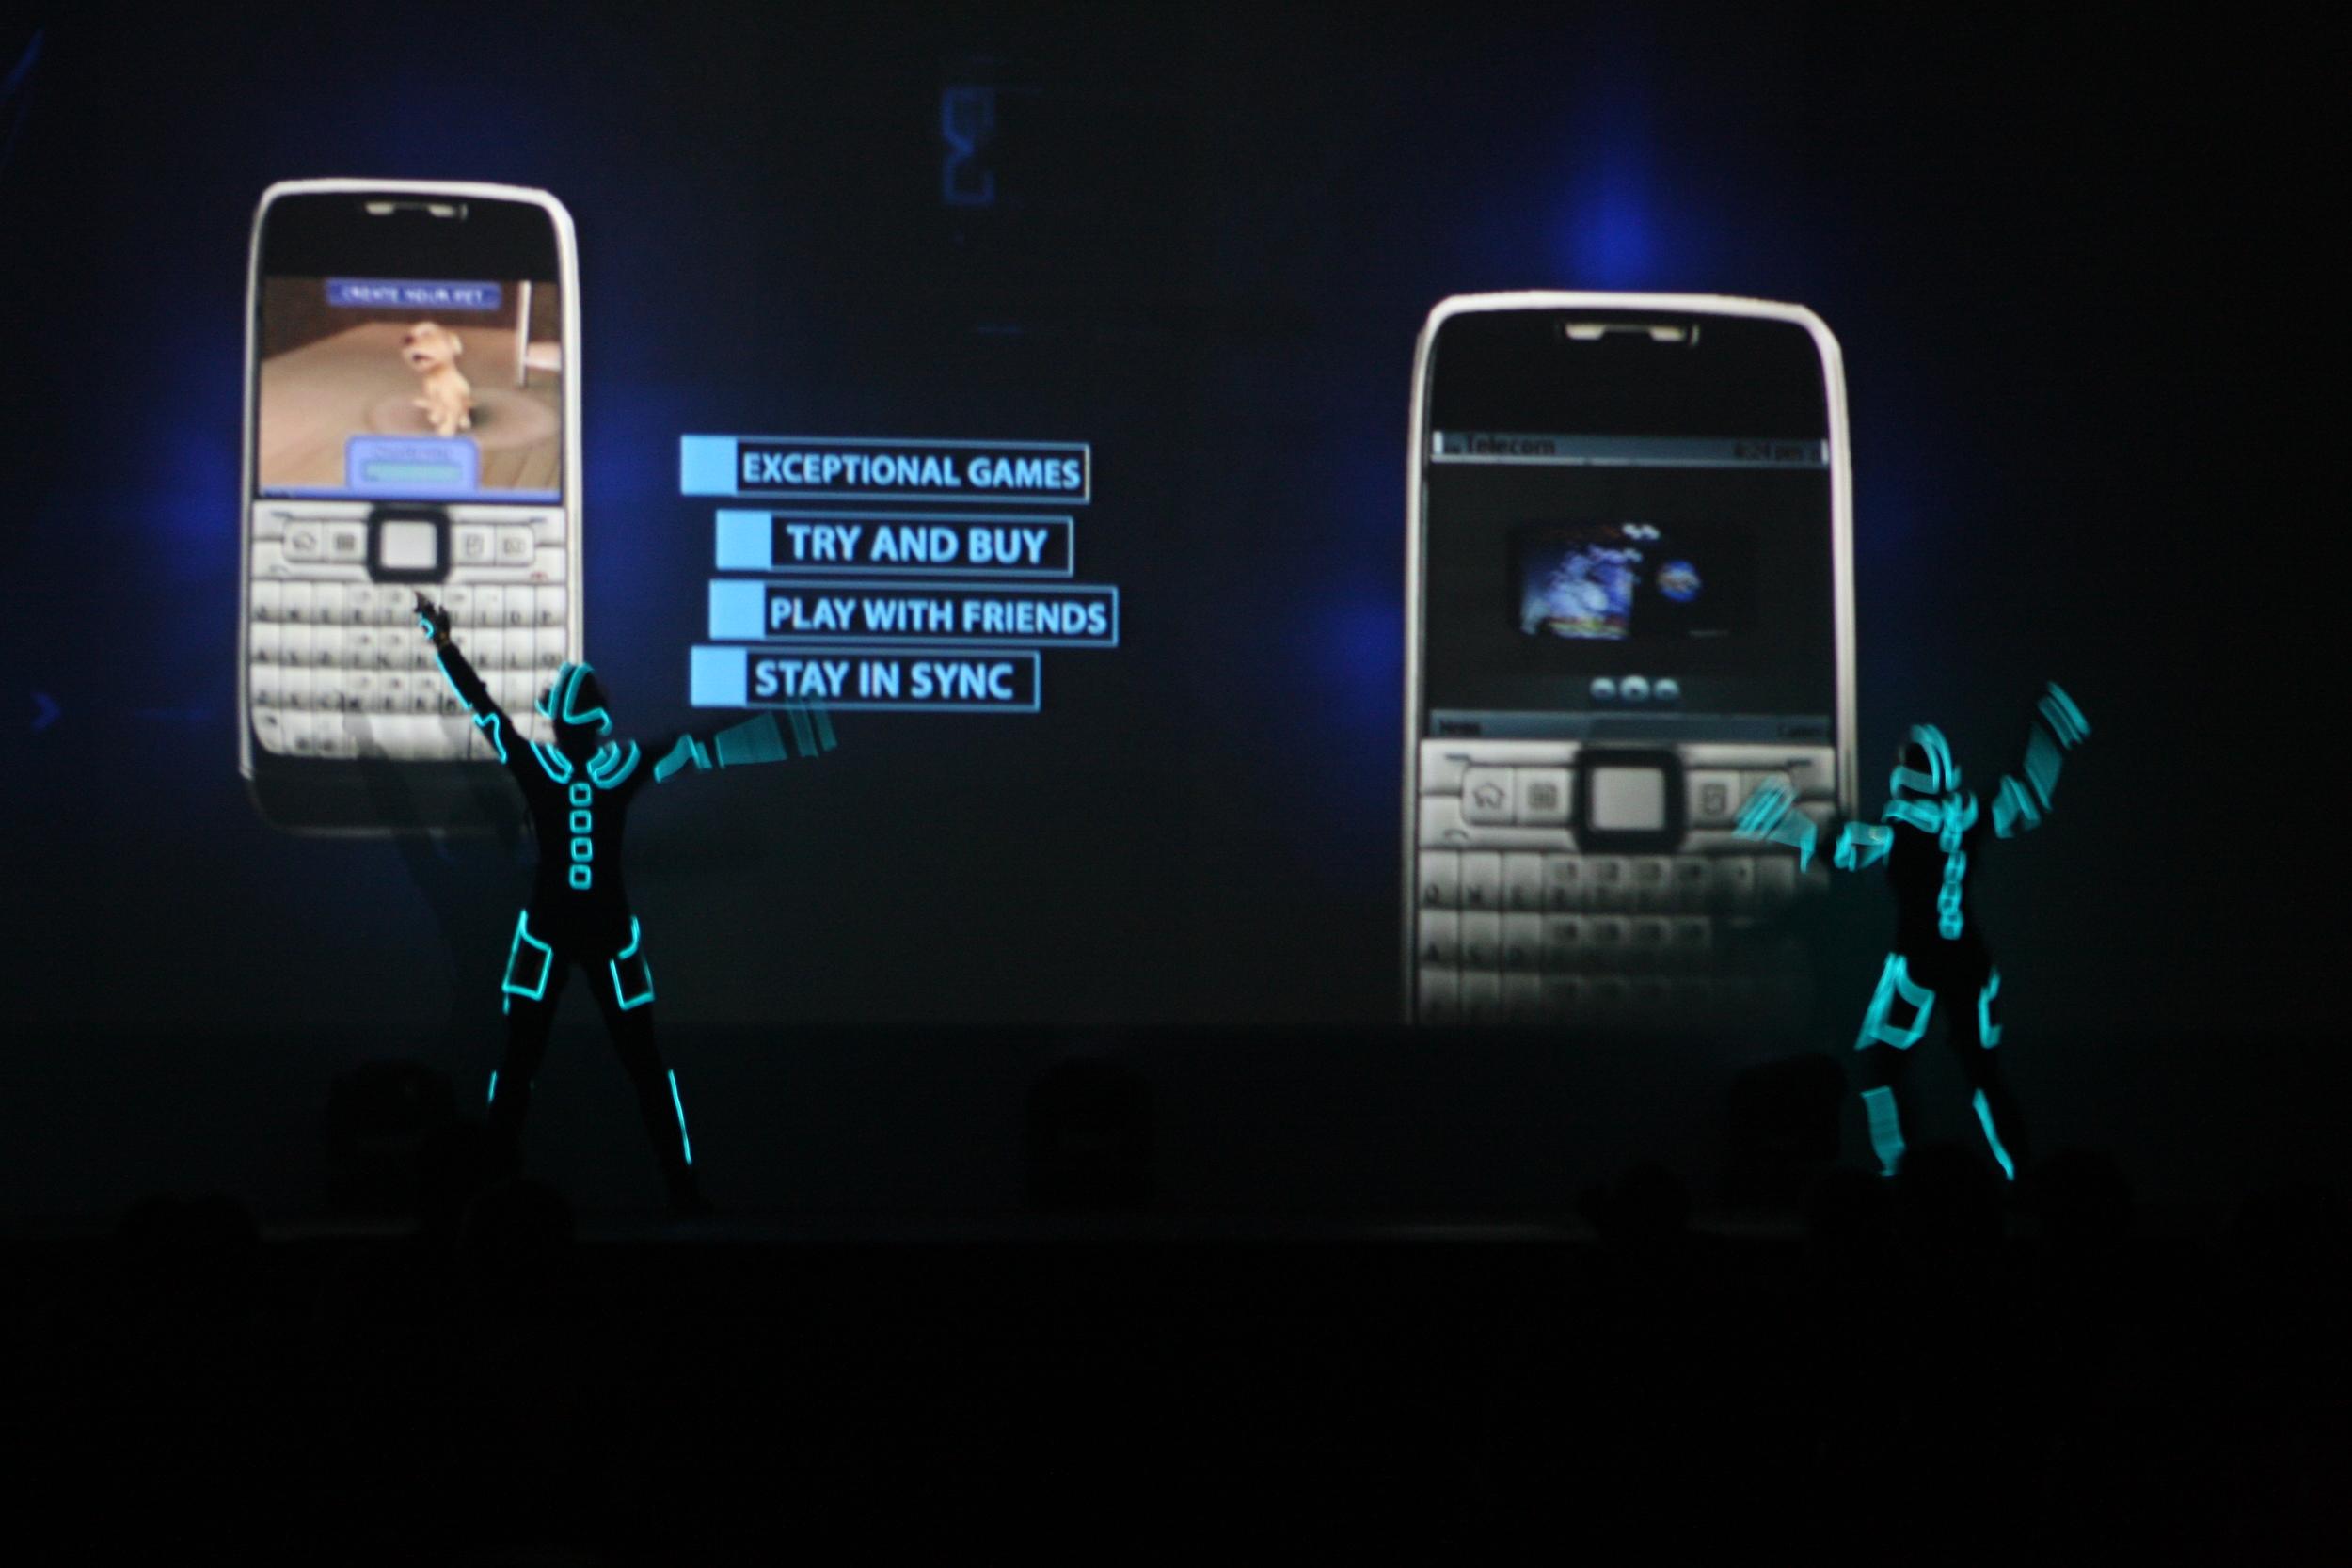 blackberry features